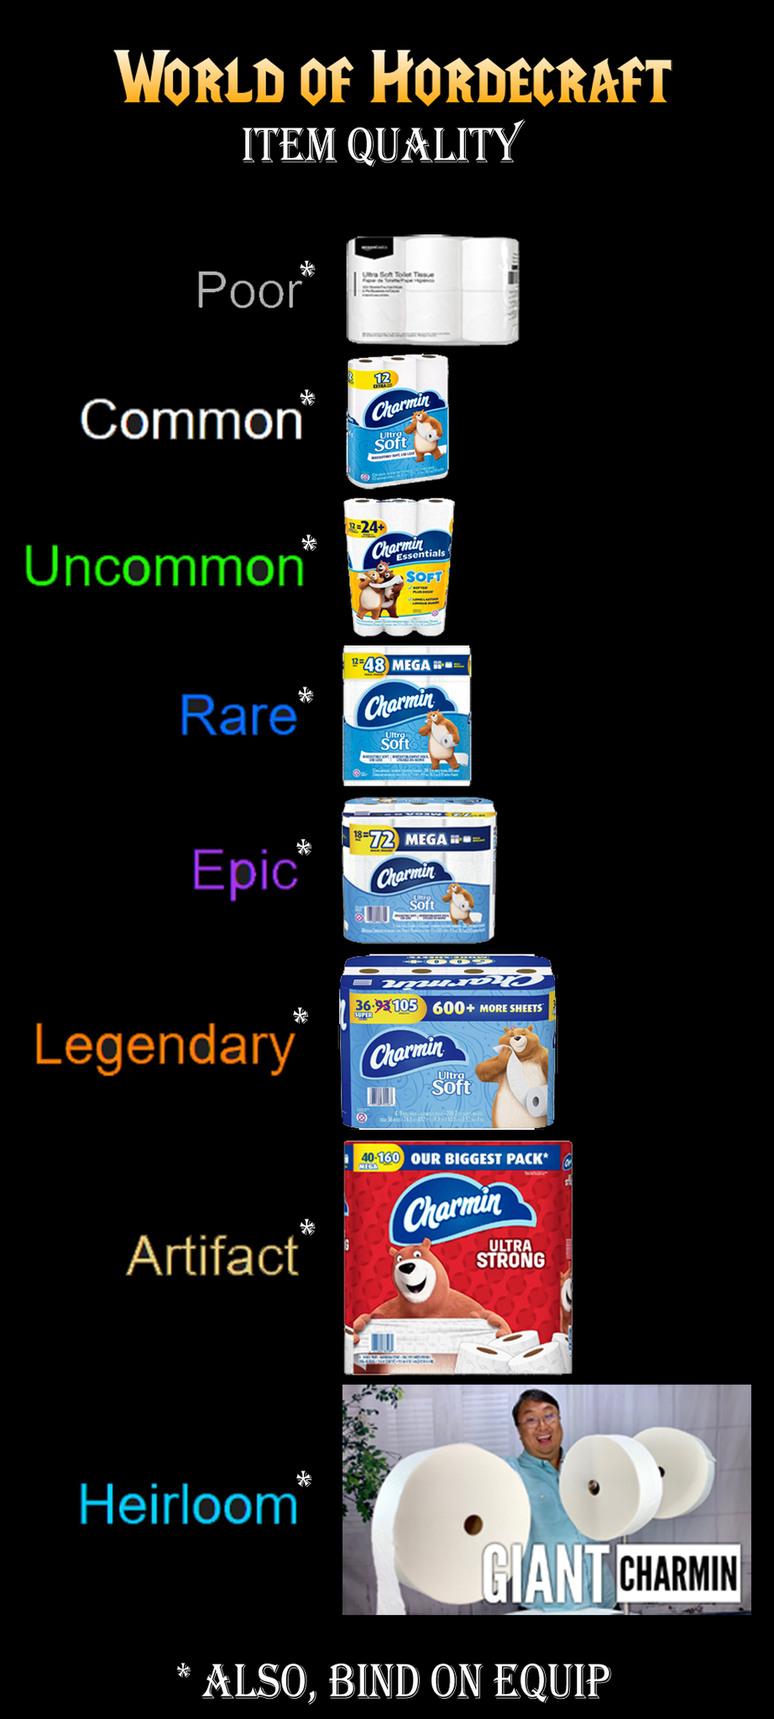 World of Hordecraft - meme